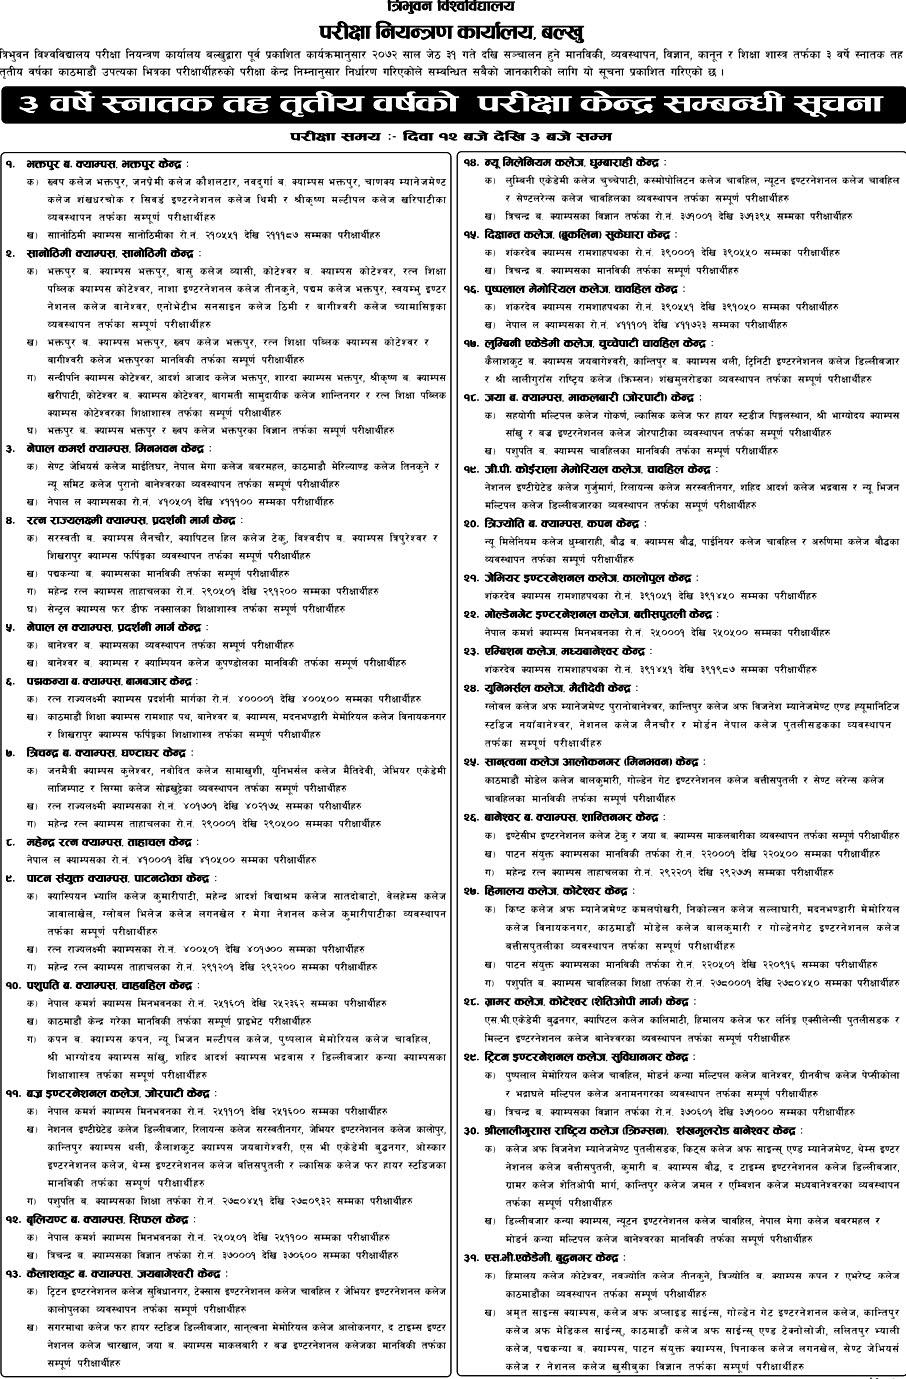 TU-Bachelor- 3rd-year-exam-center-2072